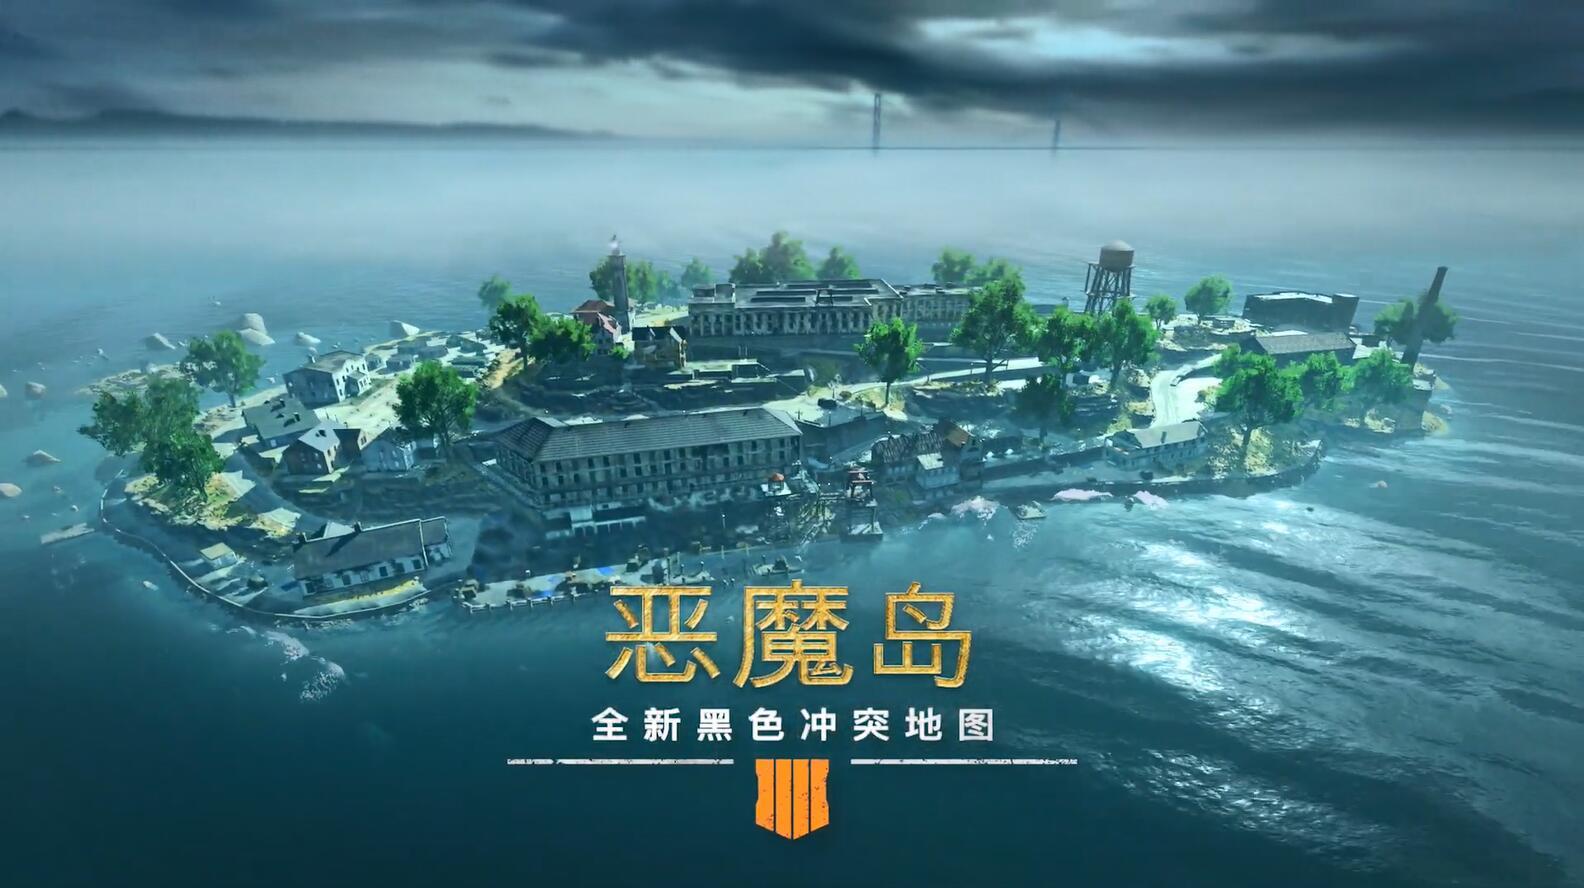 "《COD15》大逃杀新图""恶魔岛""上线 四月免费畅玩"